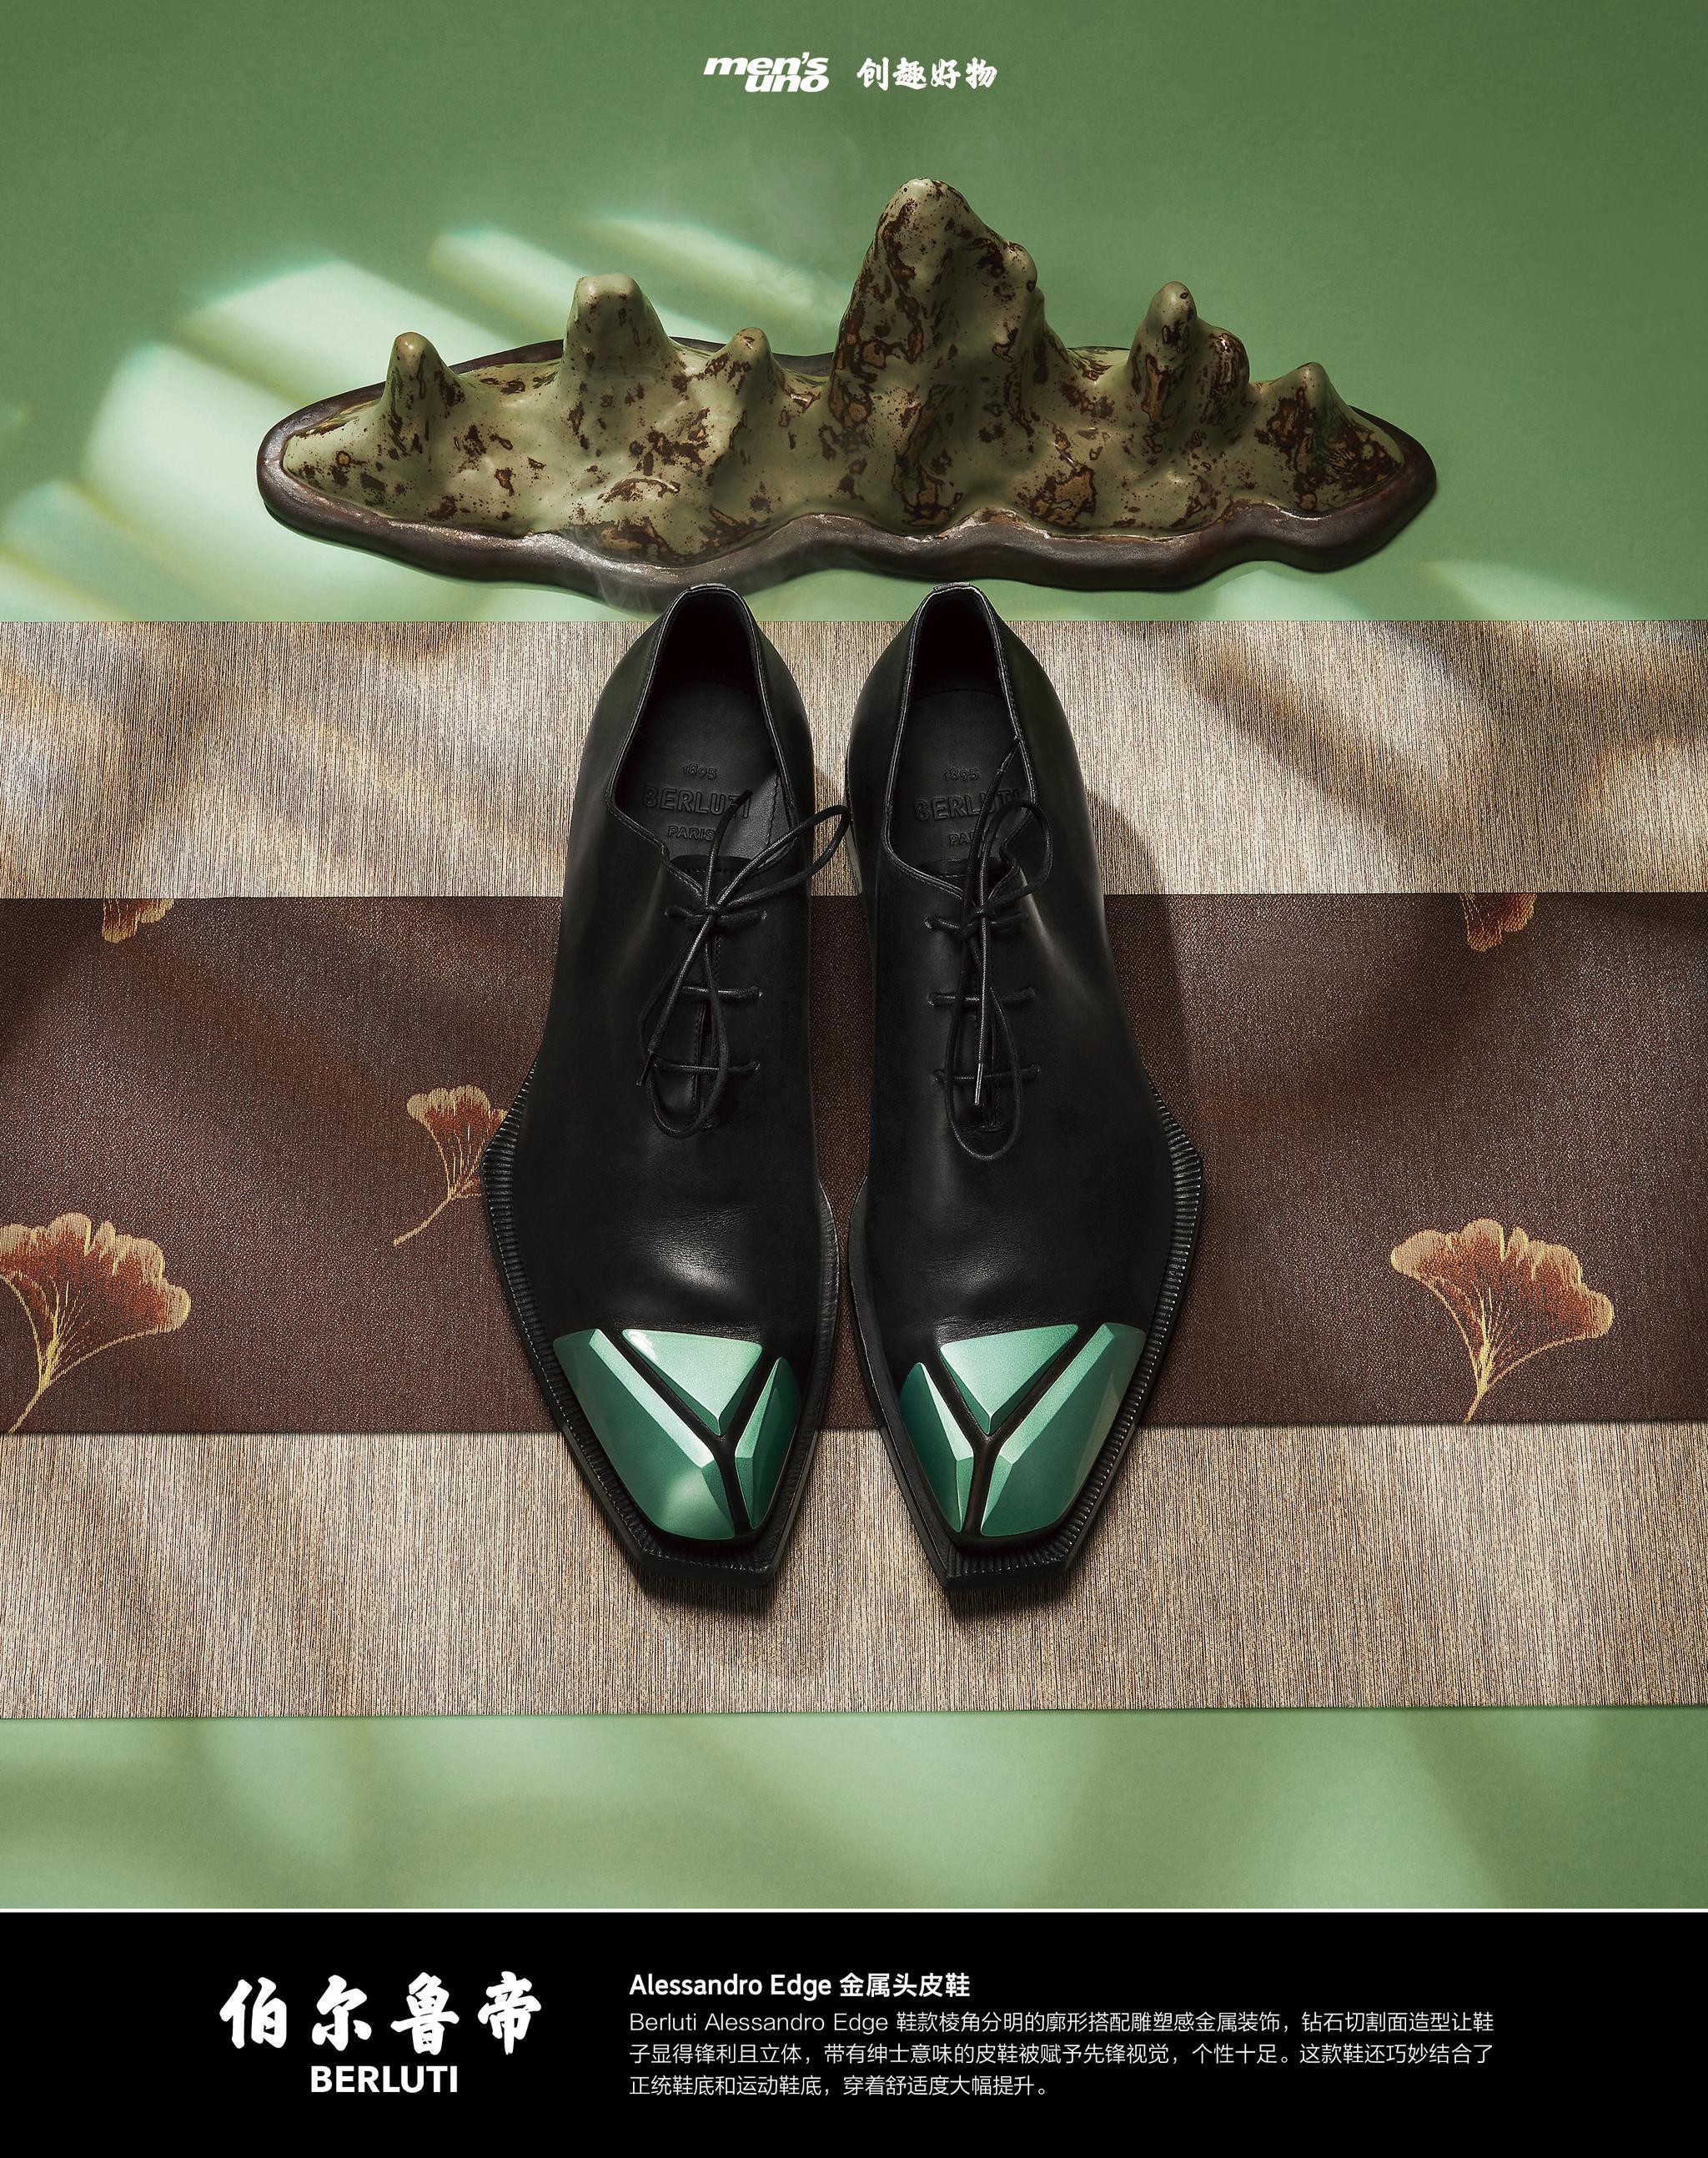 Berluti Alessandro Edge 鞋款棱角分明的廓形搭配雕塑感金属装饰